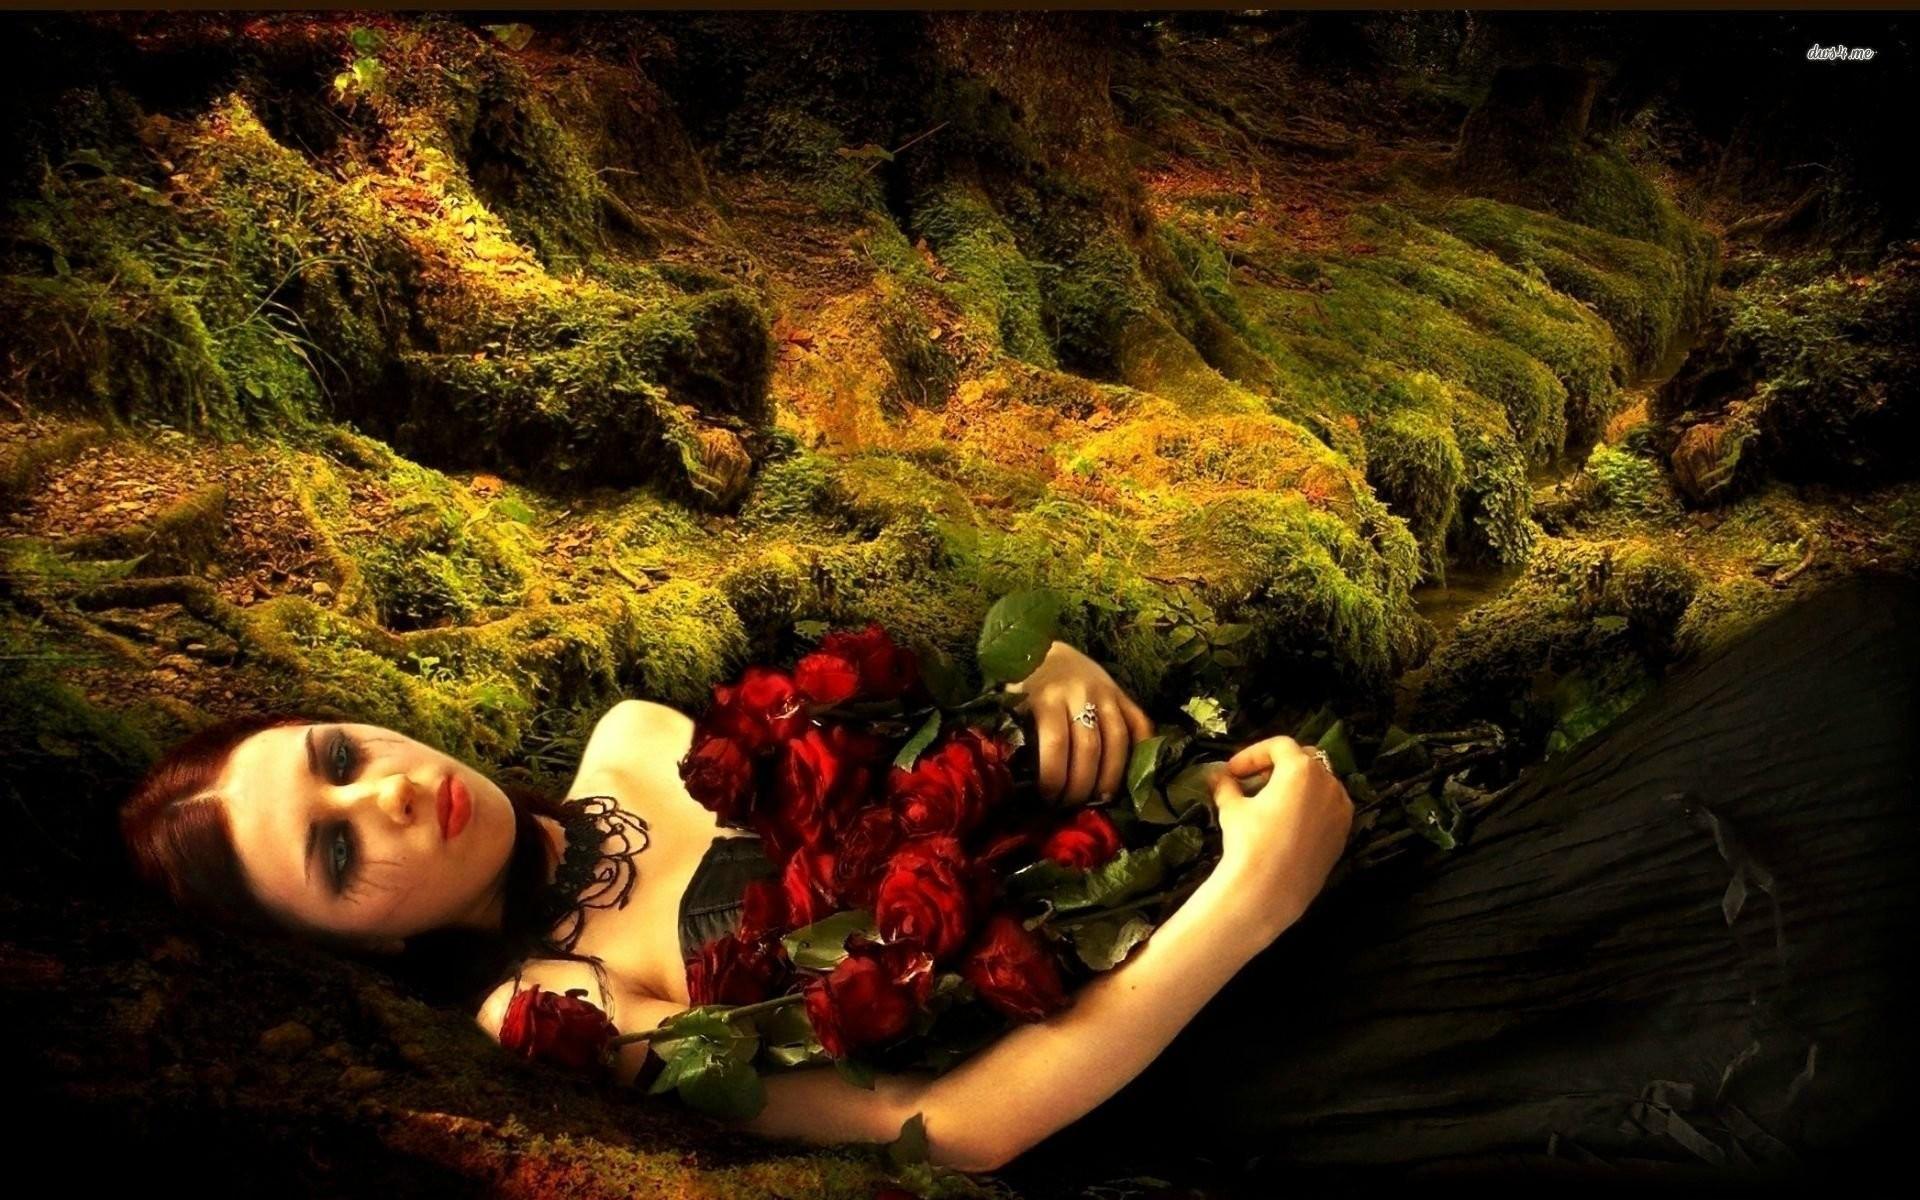 Sad Girl Holding Roses